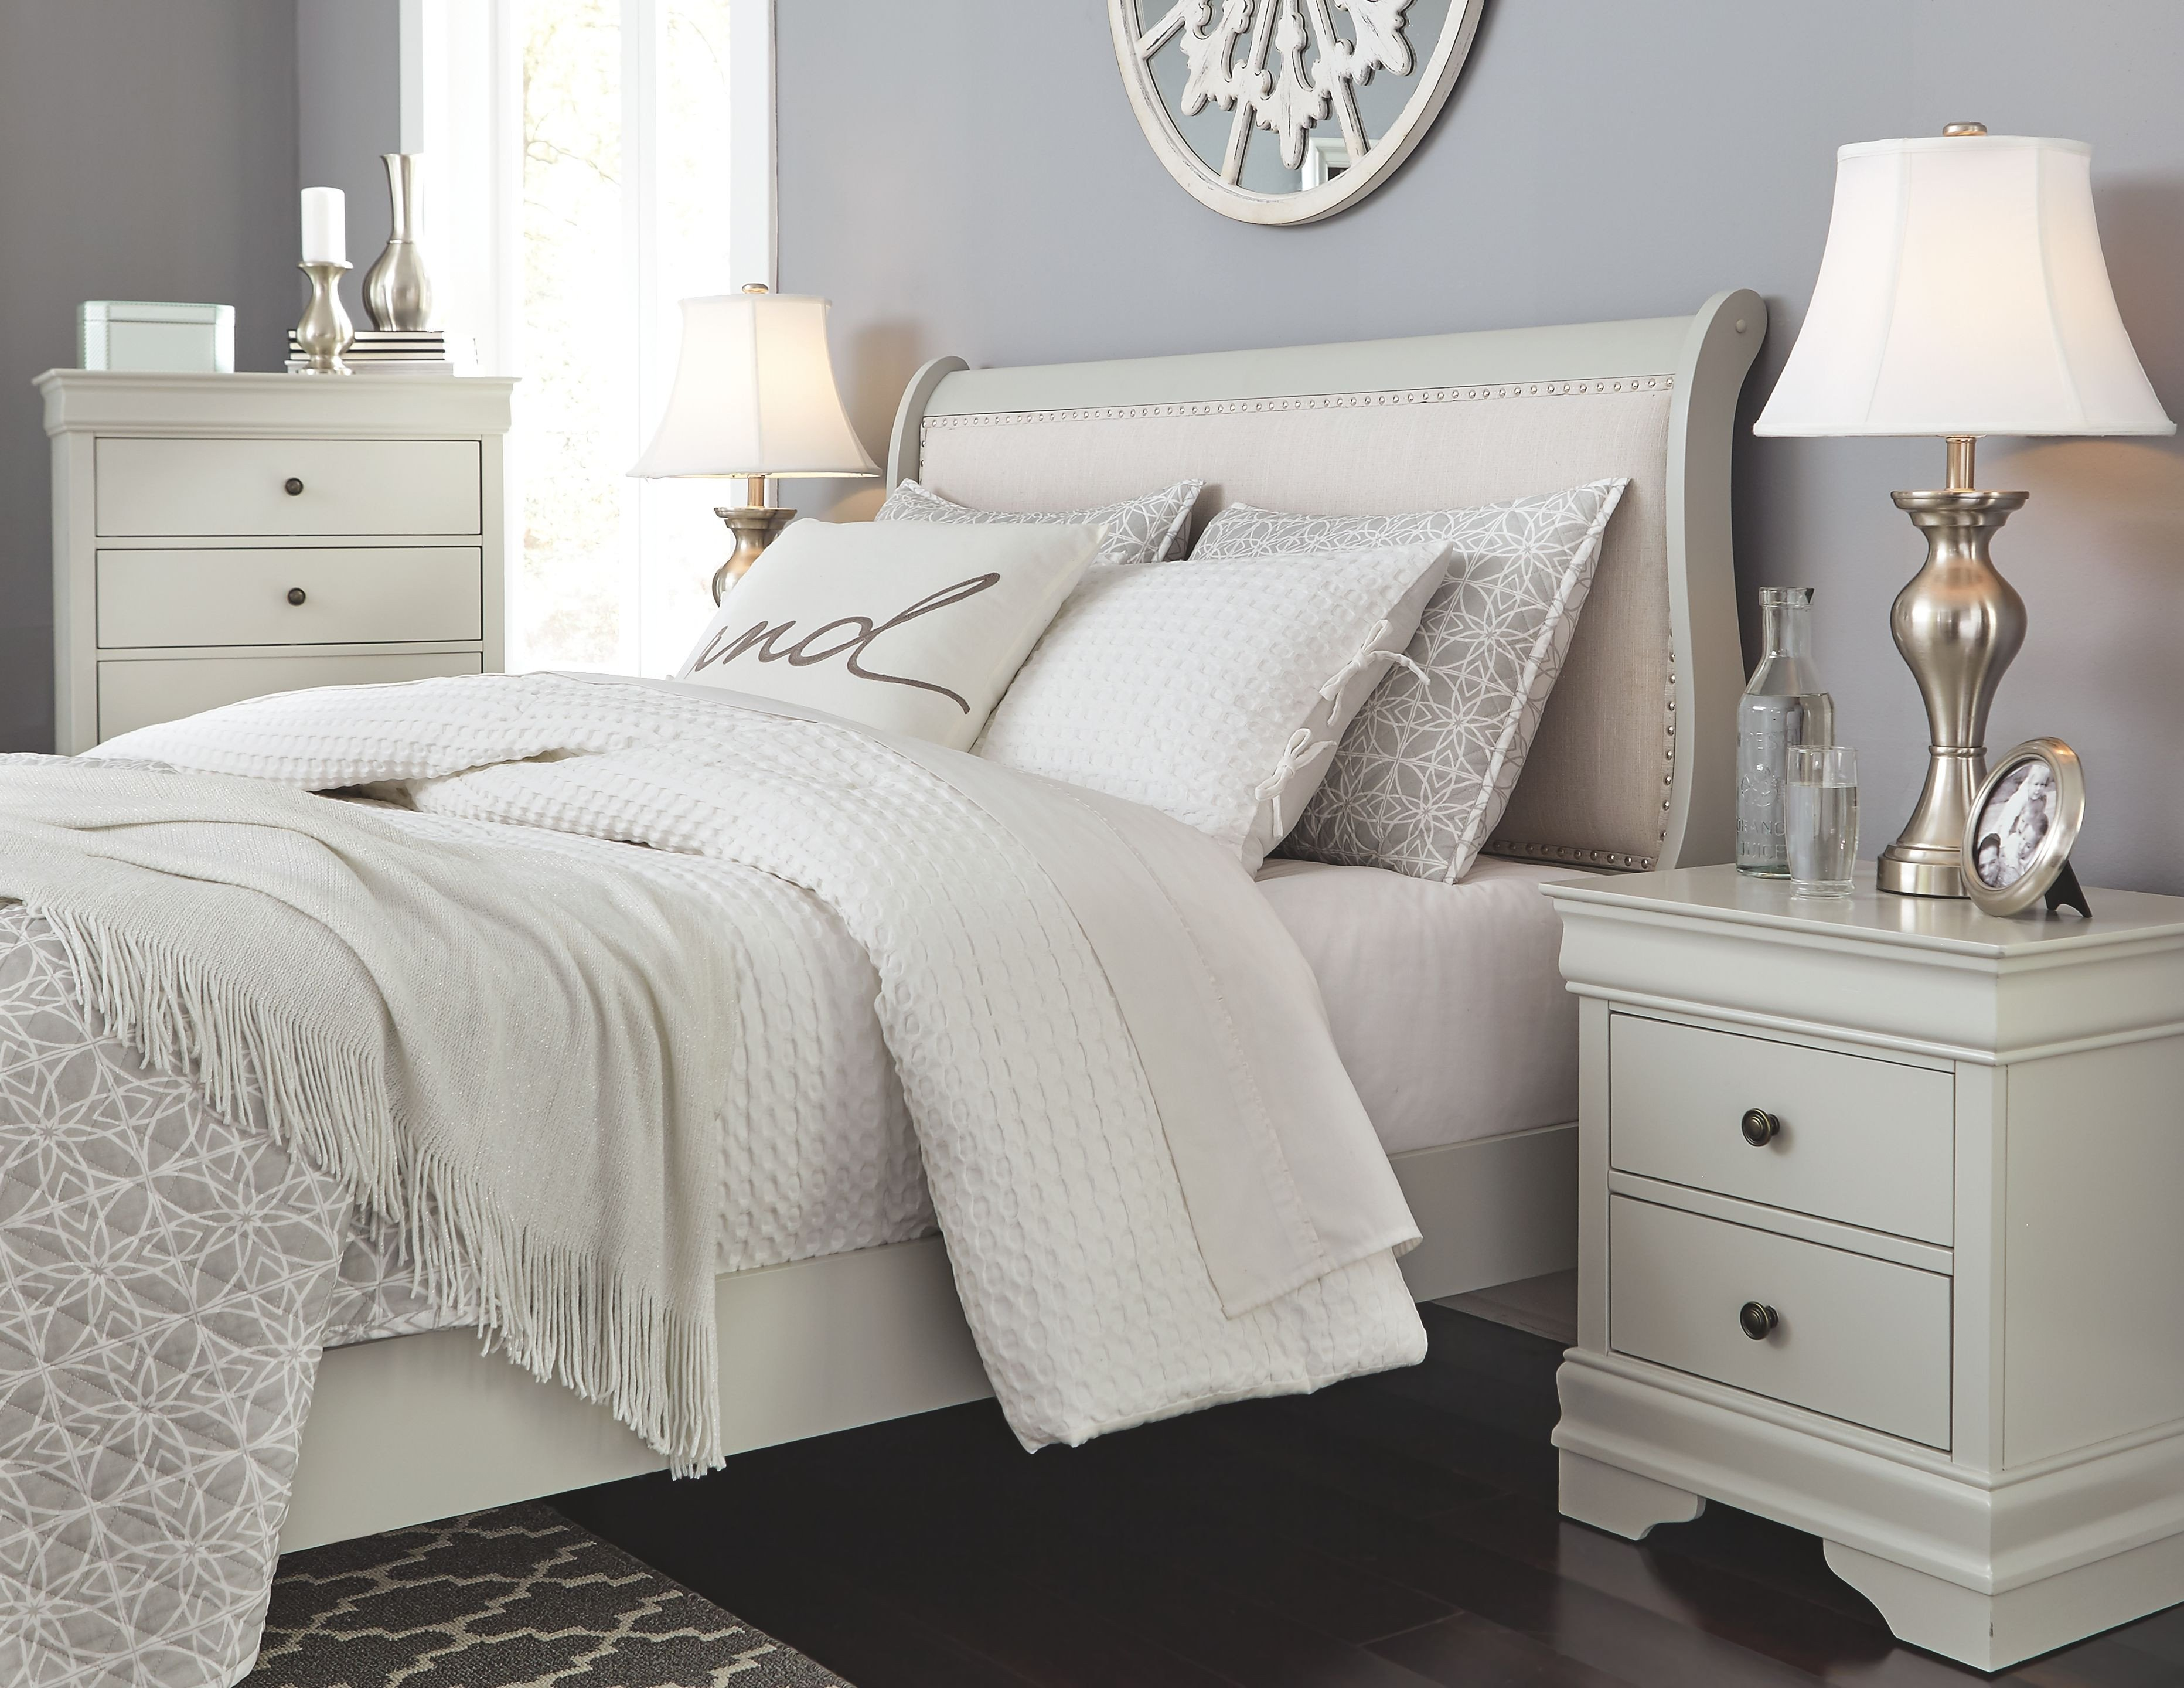 Cheap Bedroom Set Online Inspirational Jorstad Full Bed with 2 Nightstands Gray